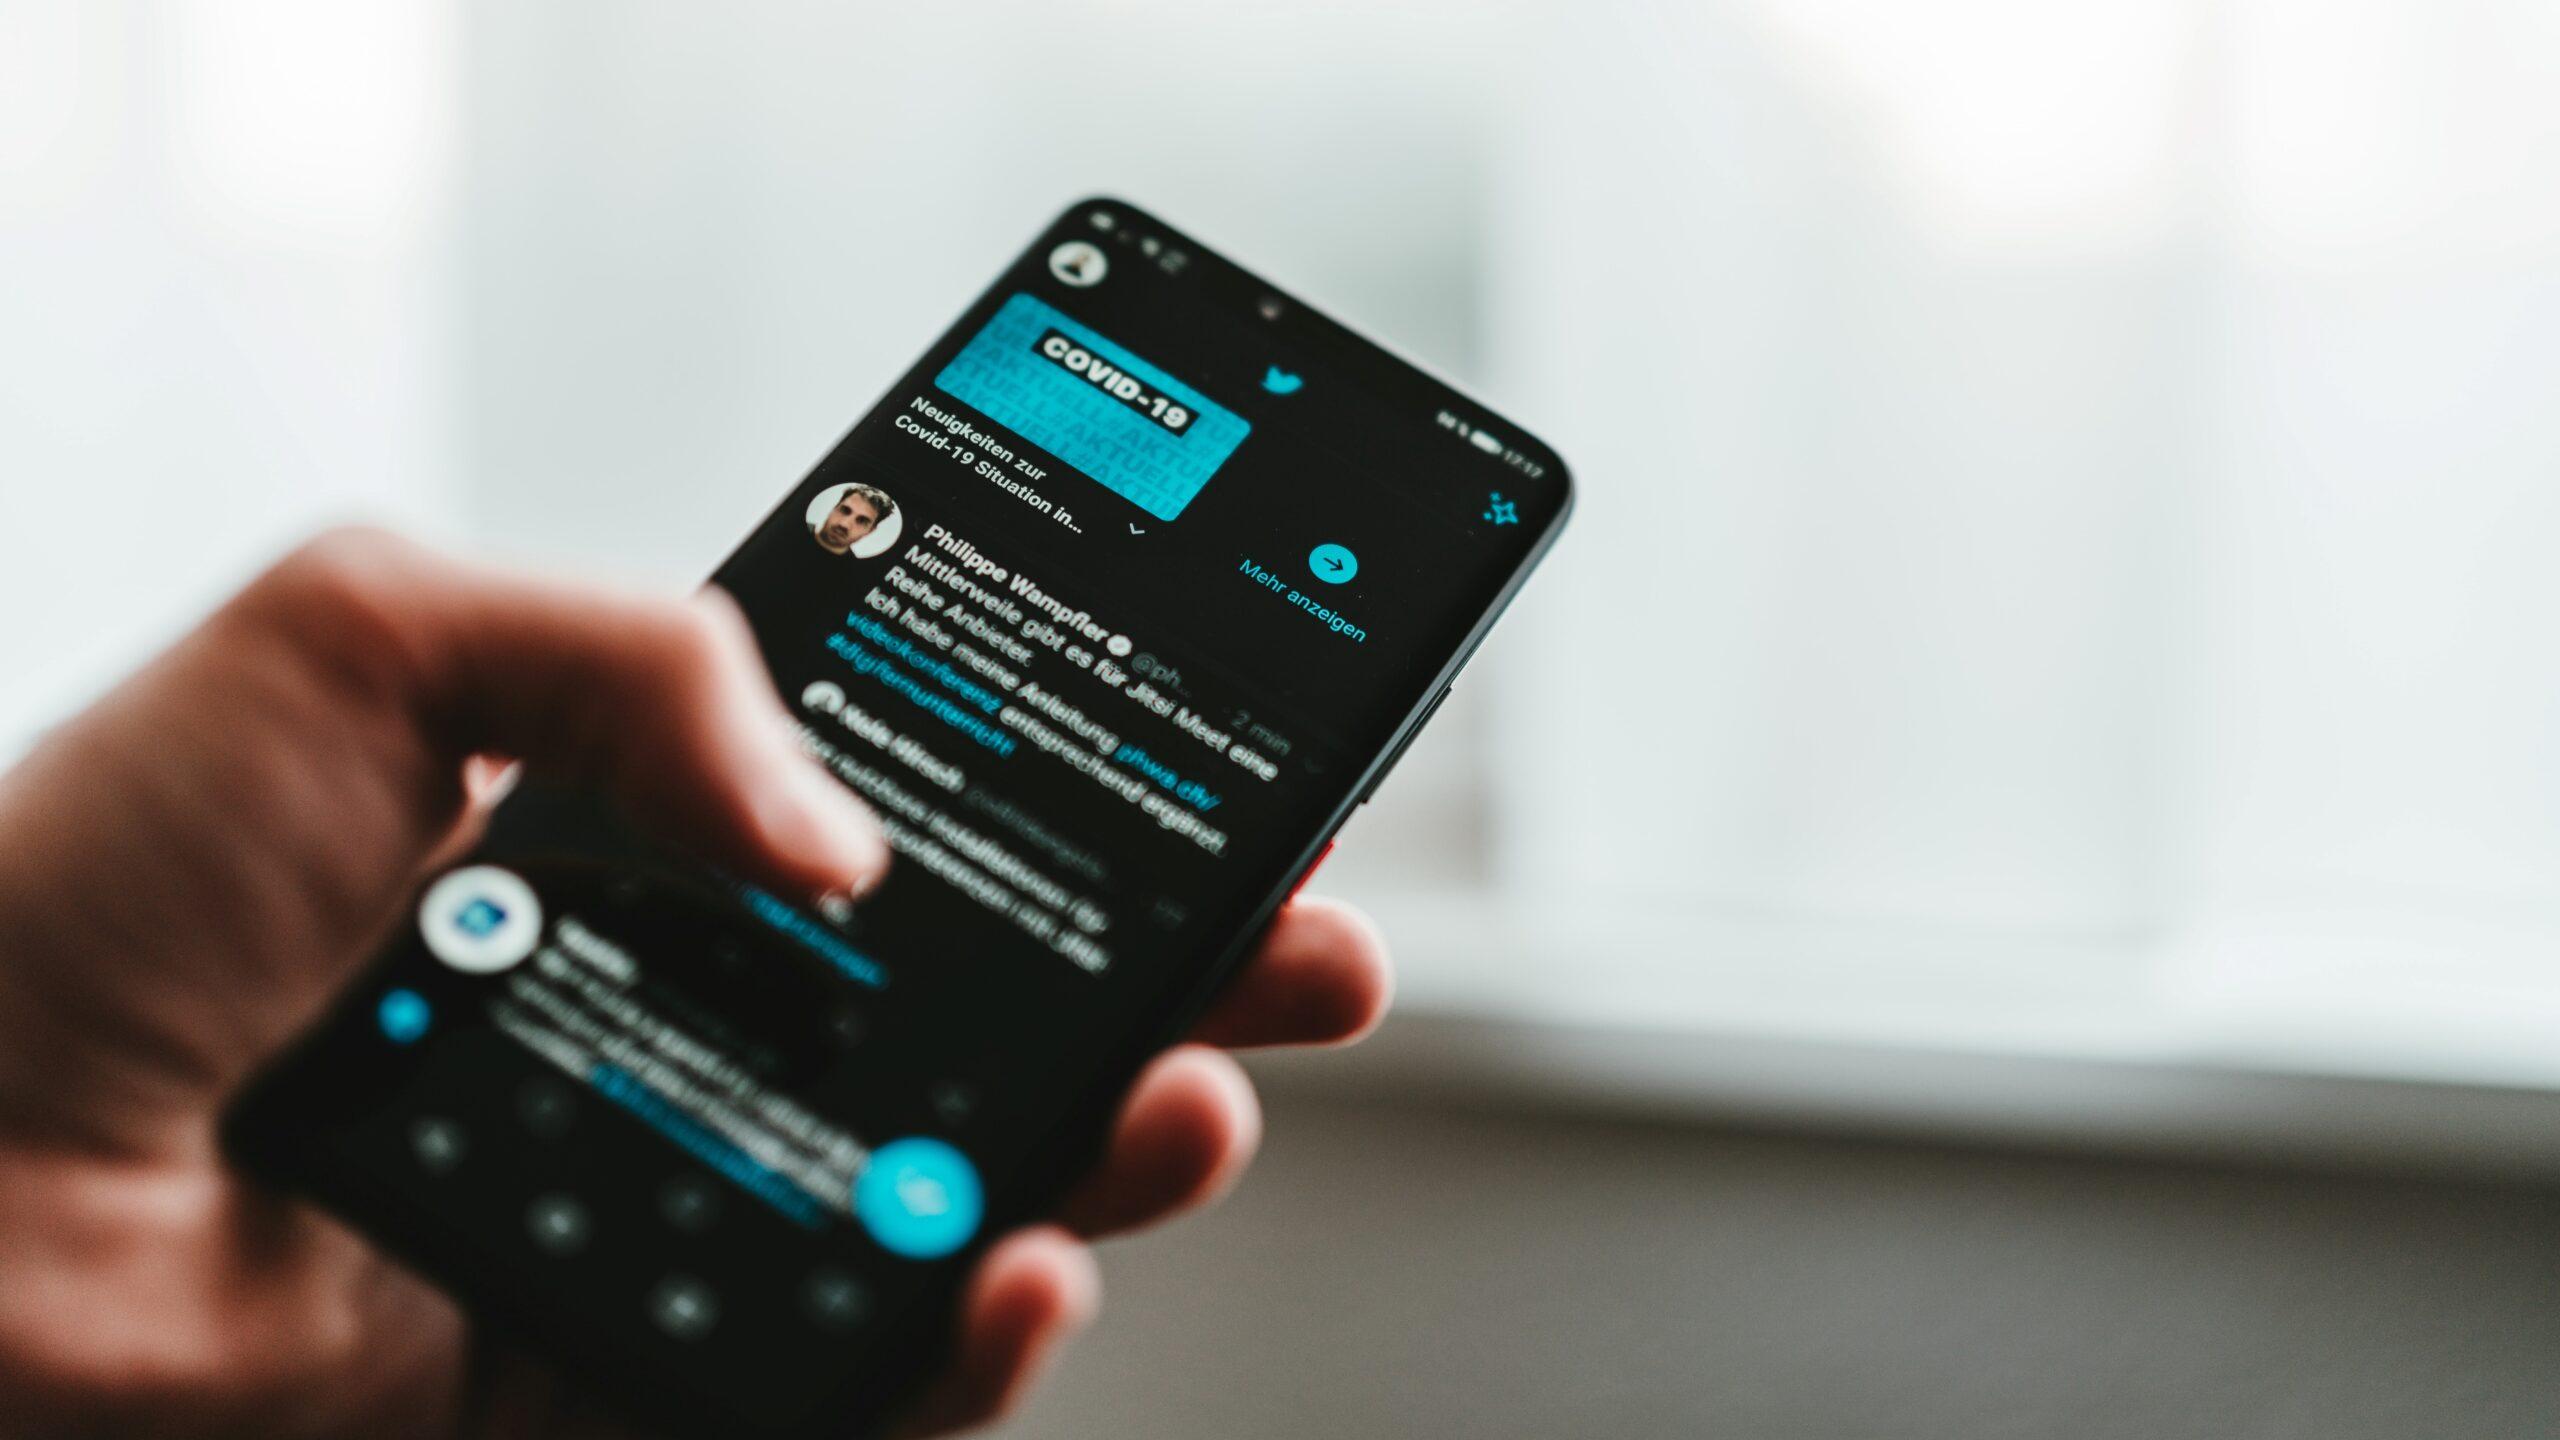 Critics Blast Twitter for Suspending Indian Writer's Account